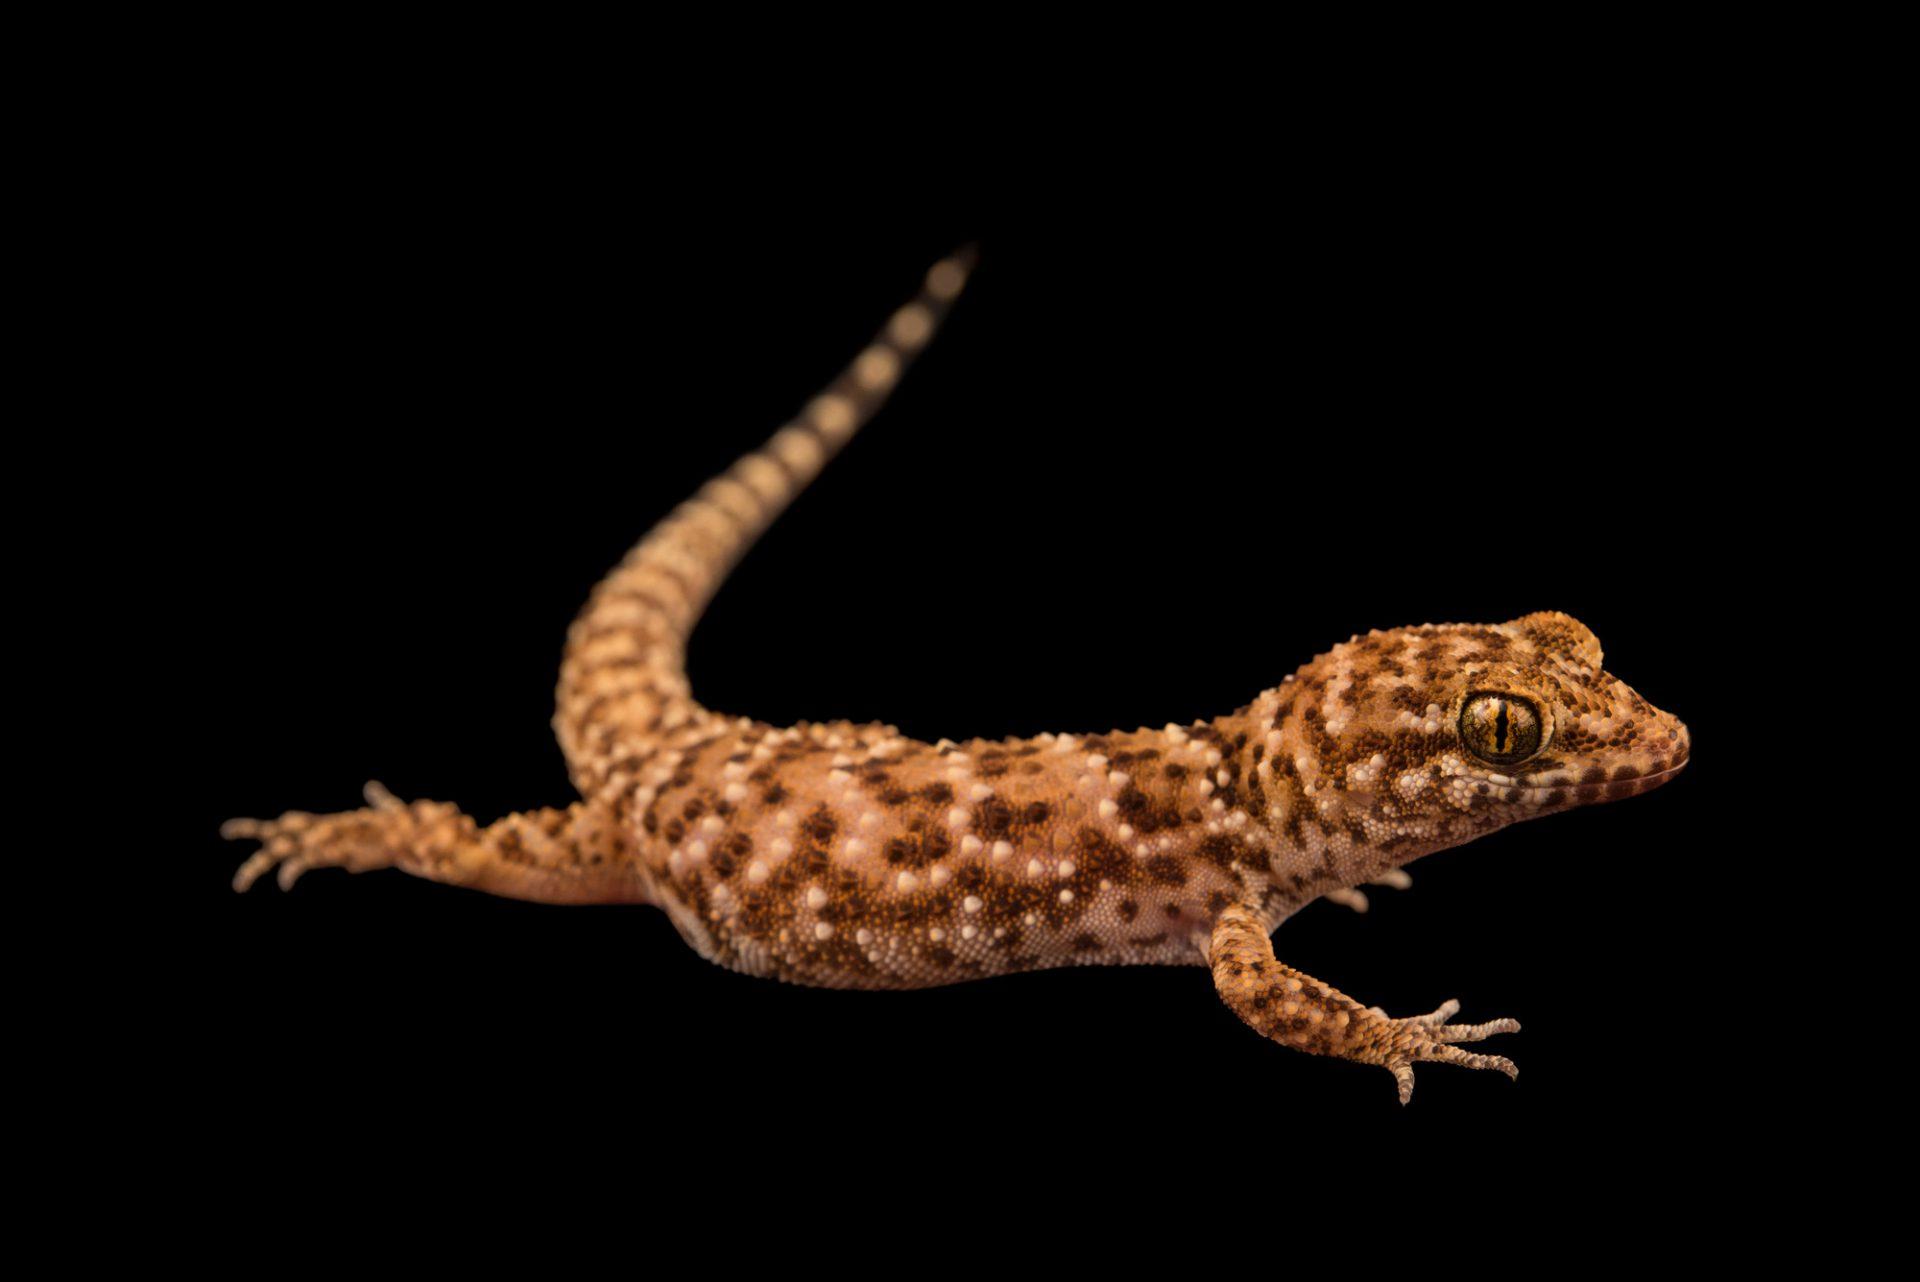 Photo: A prickly gecko (Heteronotia binoei) at Omaha's Henry Doorly Zoo.